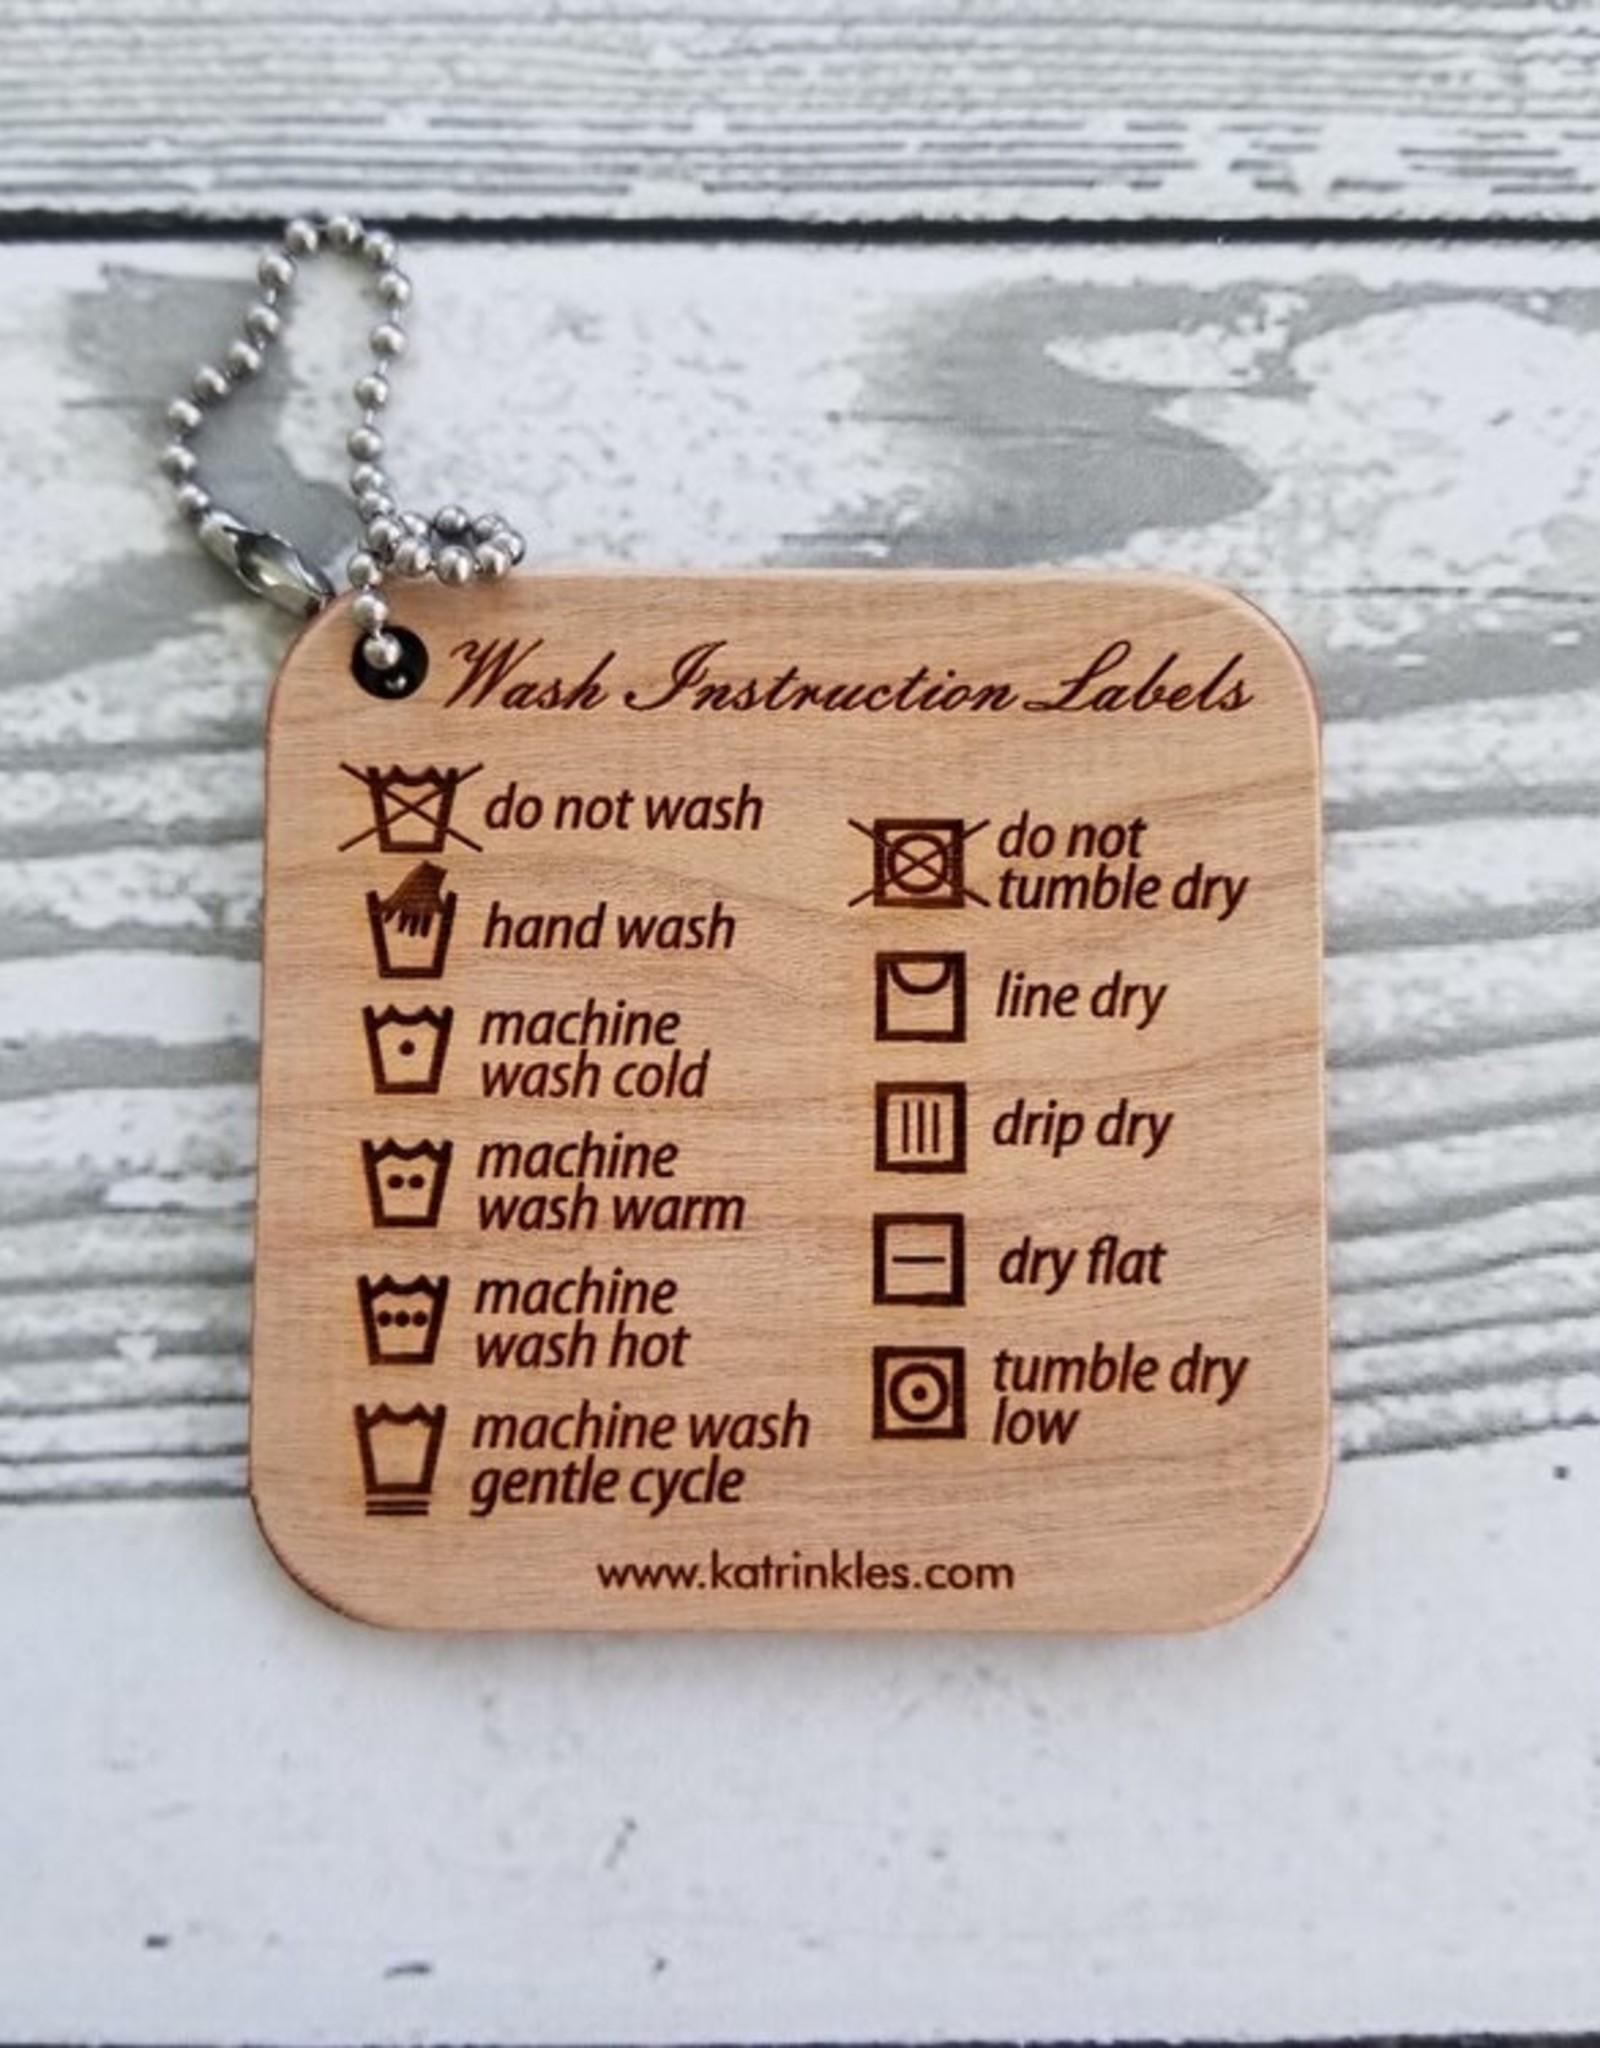 Katrinkles Katrinkles Wash Instruction Labels Mini Tool